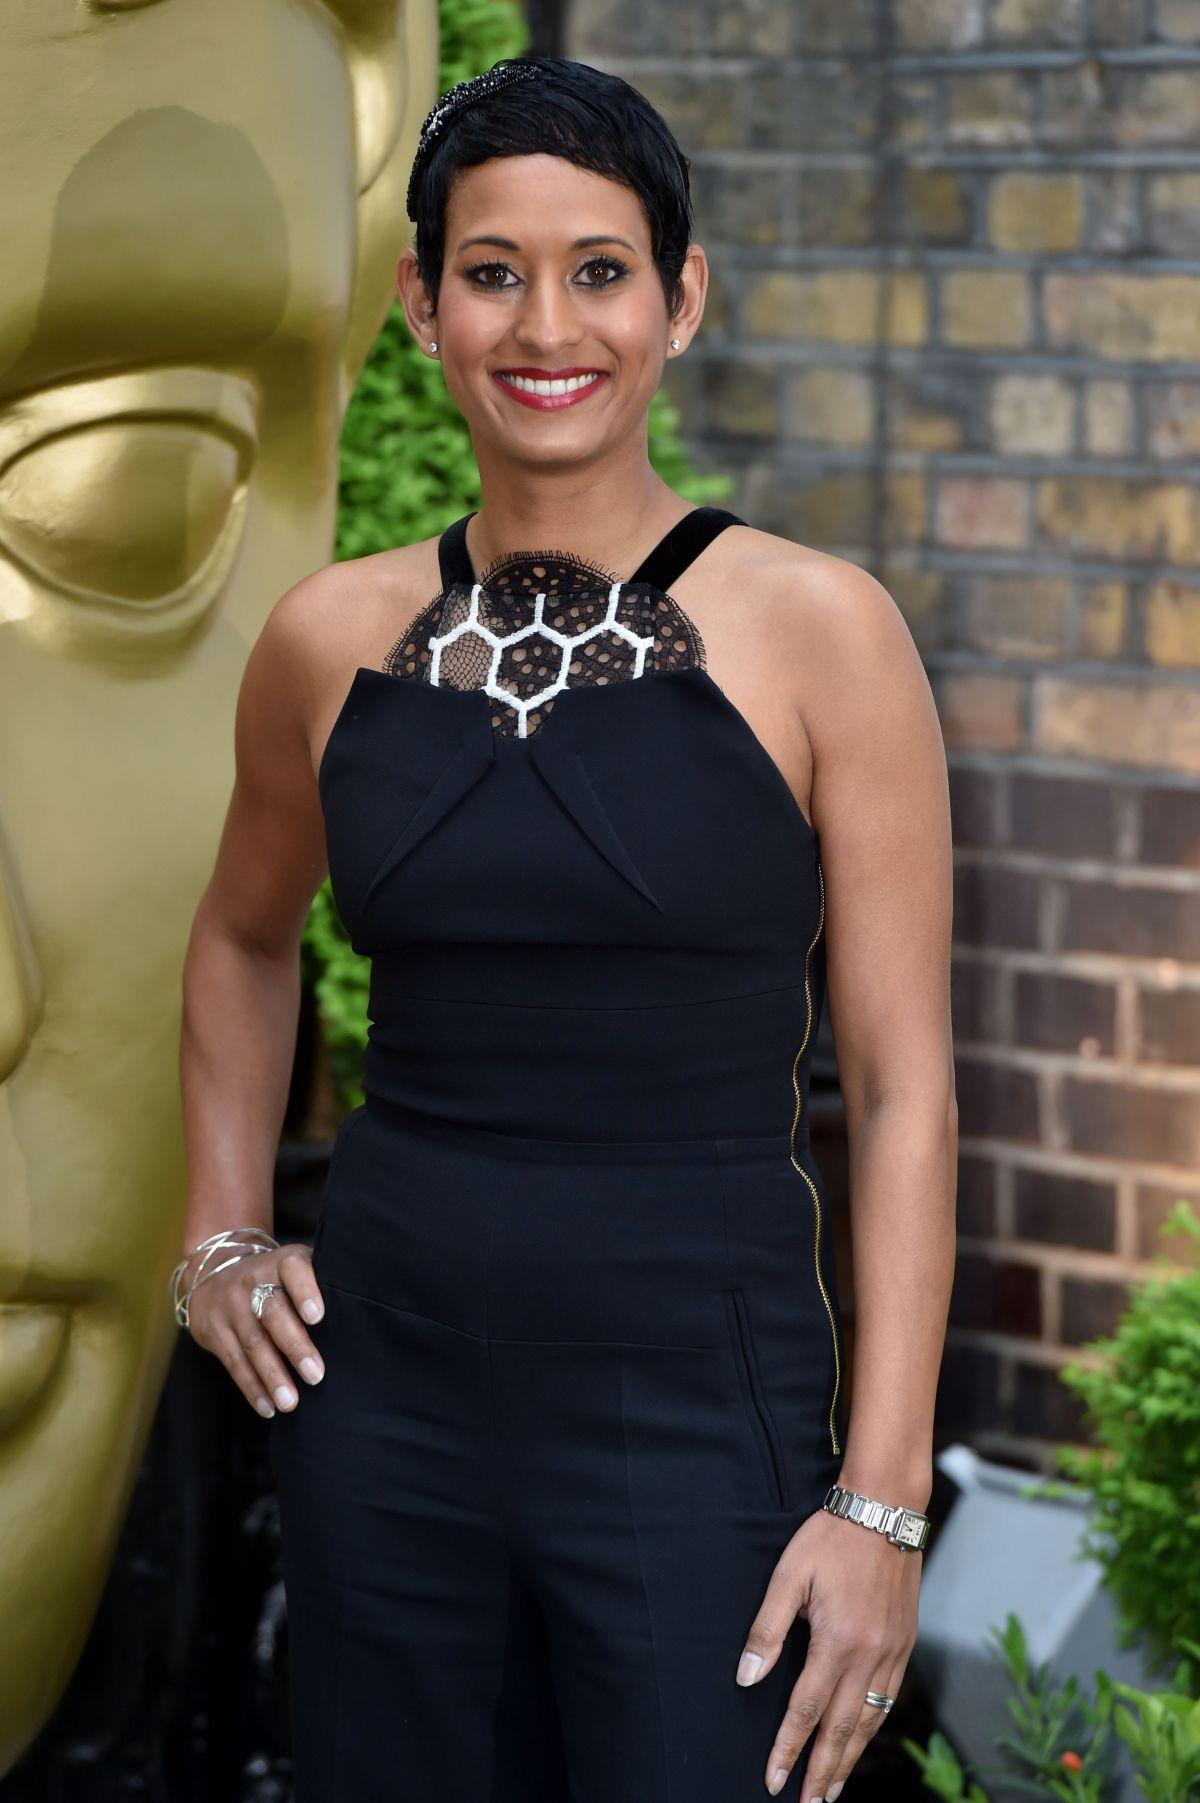 NAGA MUNCHETTY at British Academy Television Craft Awards in London 04/23/2017